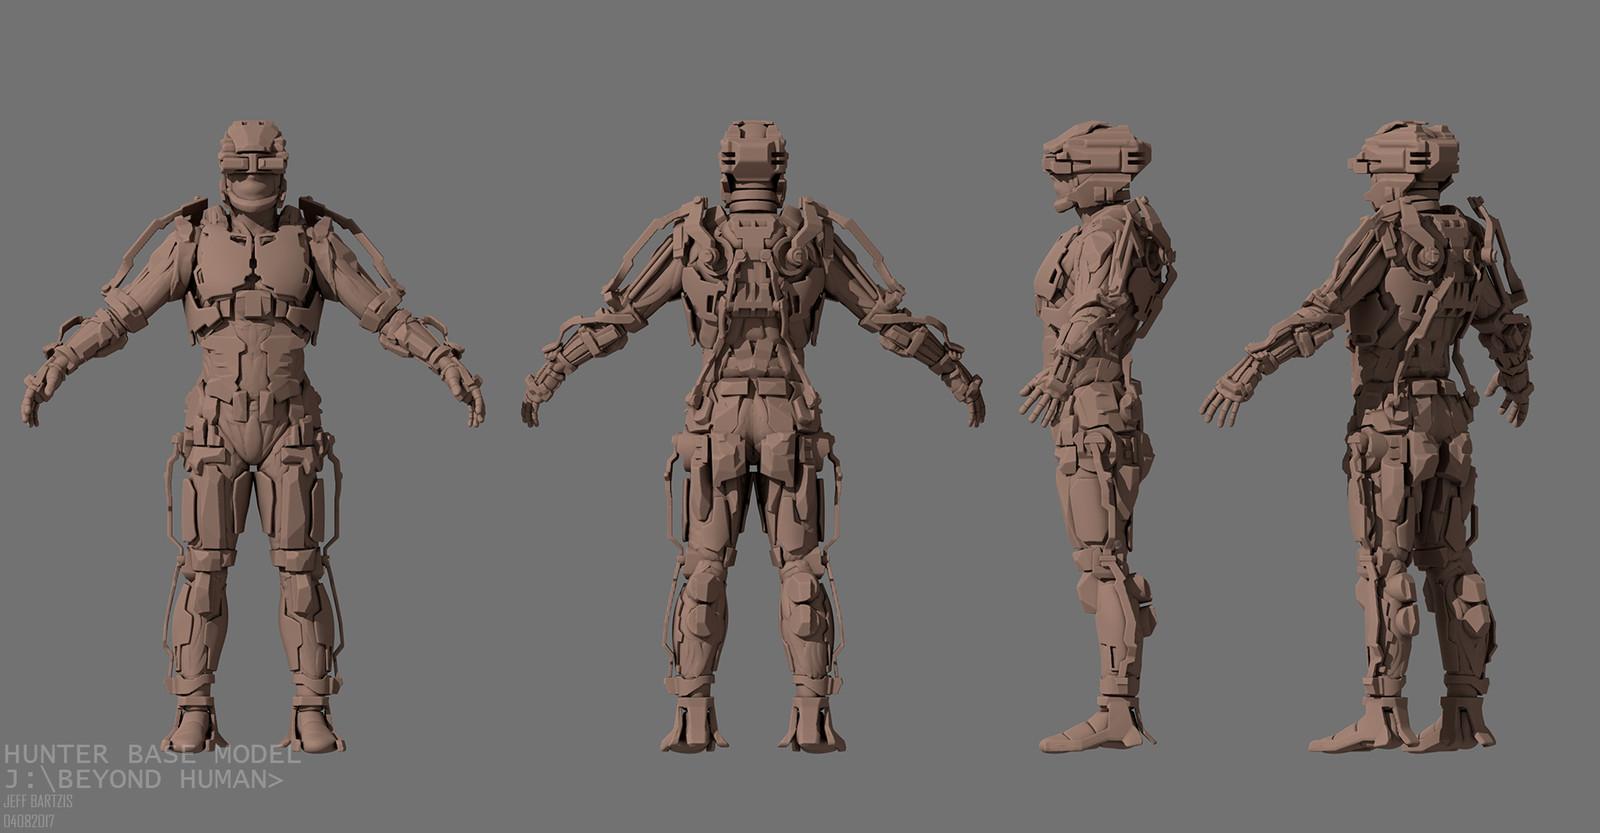 3dcoat sculpture of the hunter